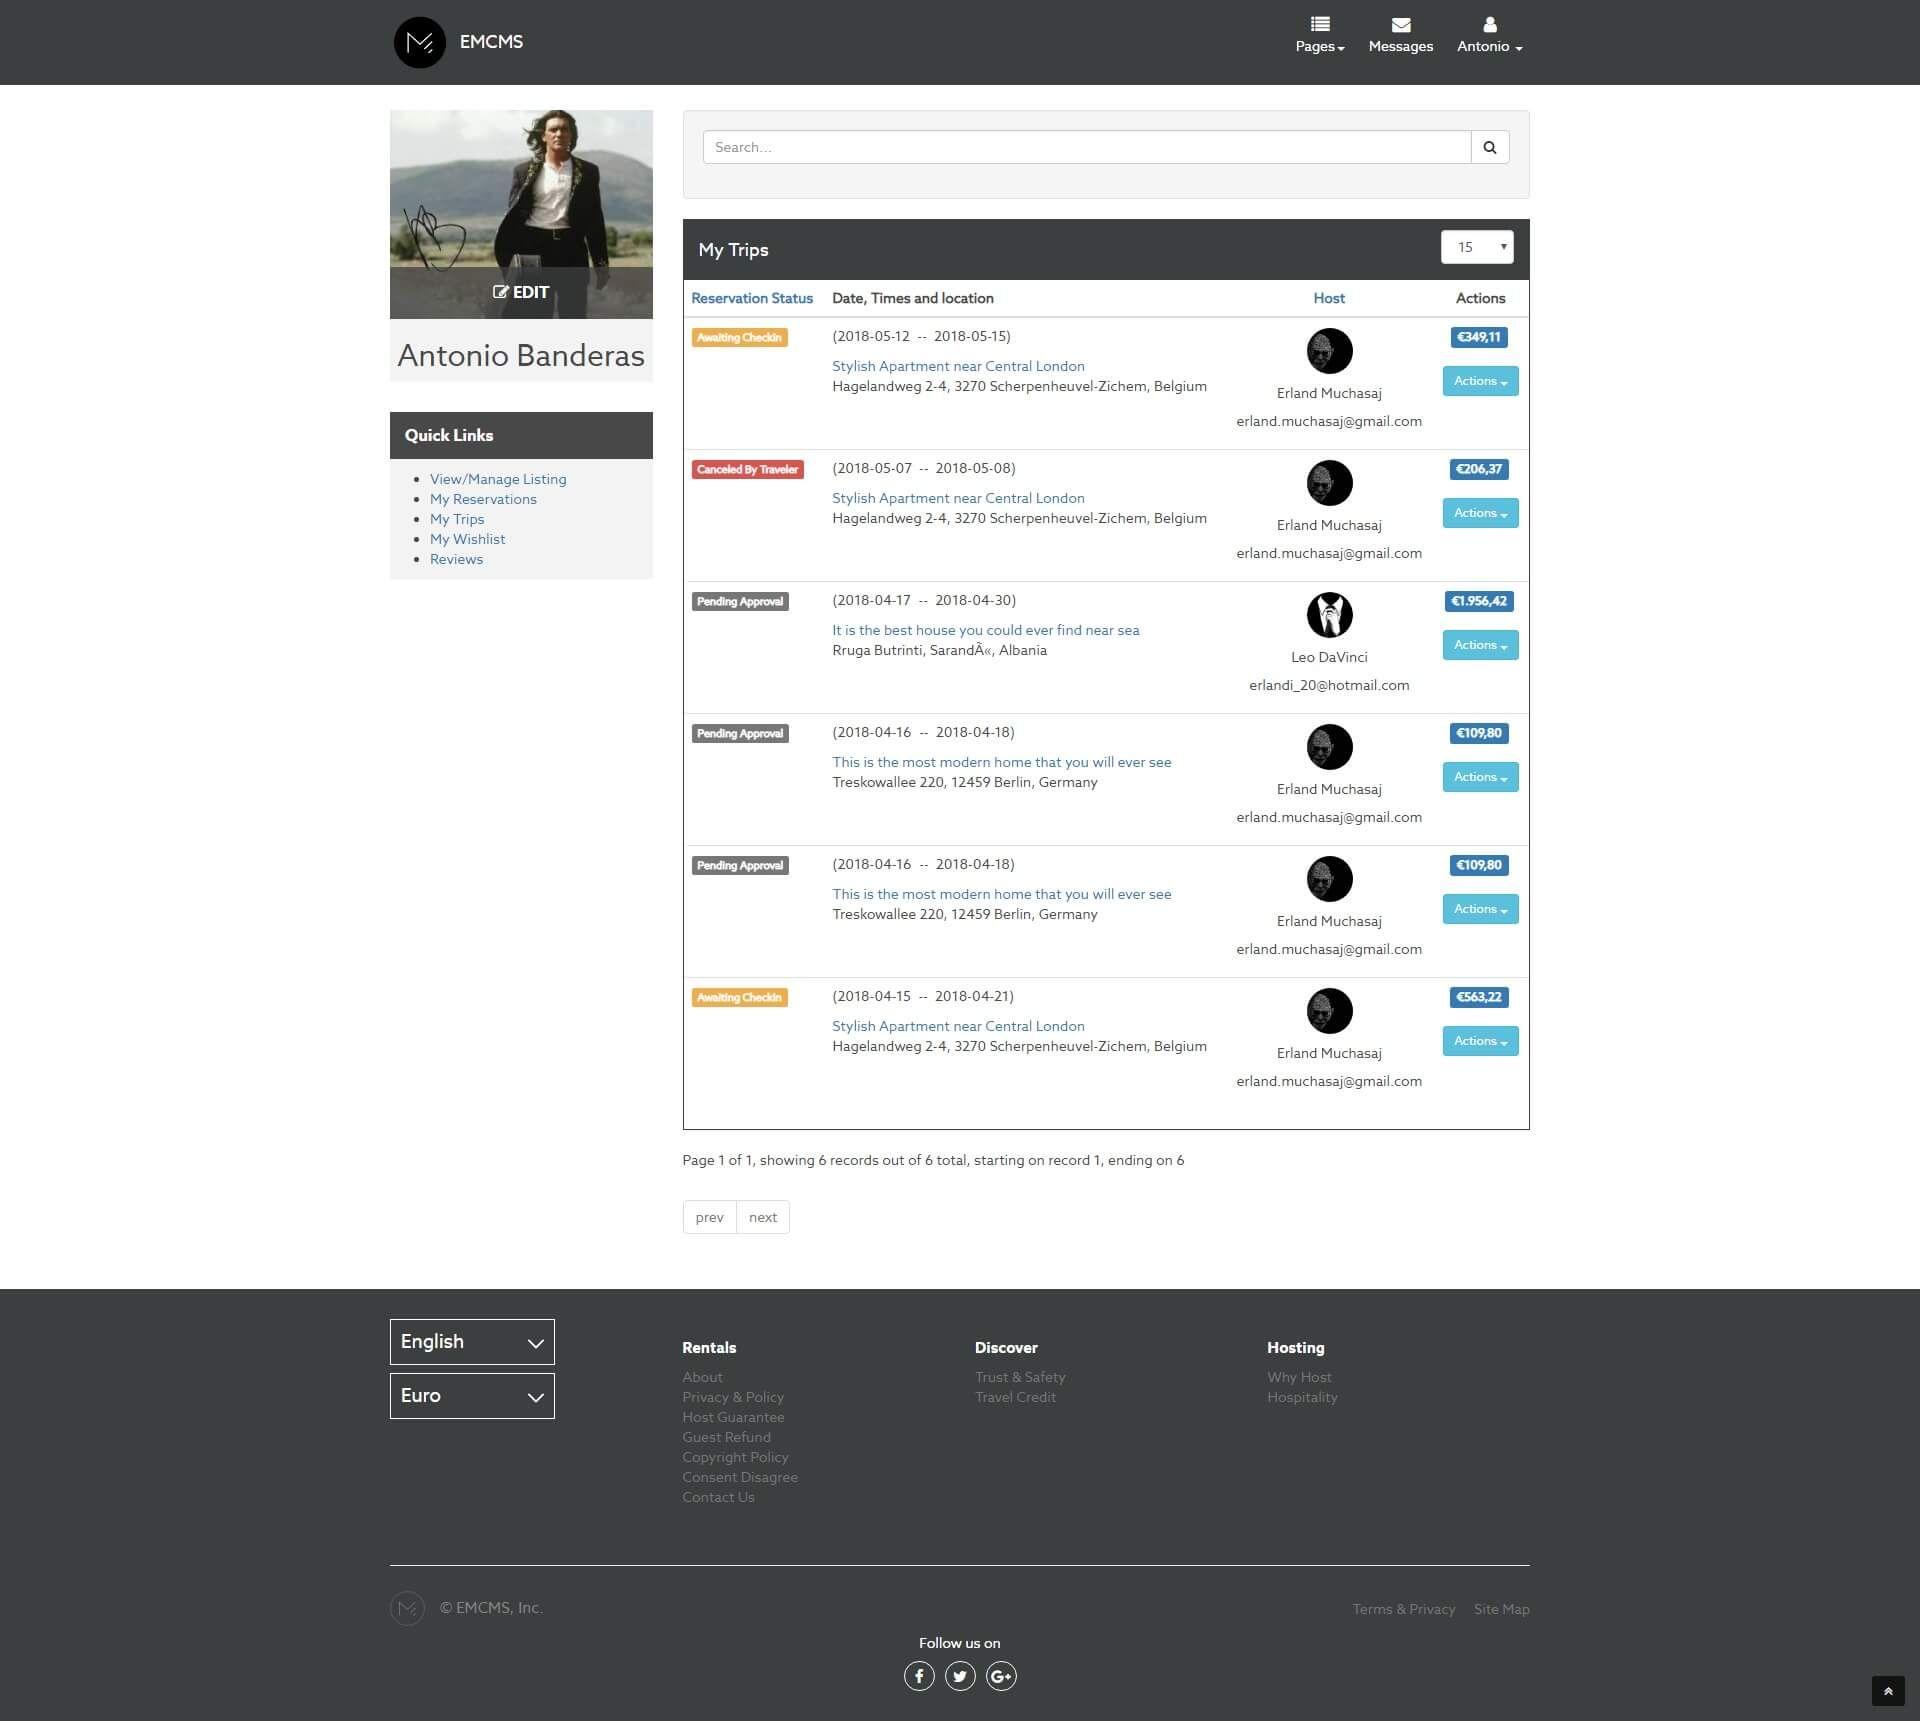 EMCMS Rental Management System by ErlandMuchasaj Ad EMCMS